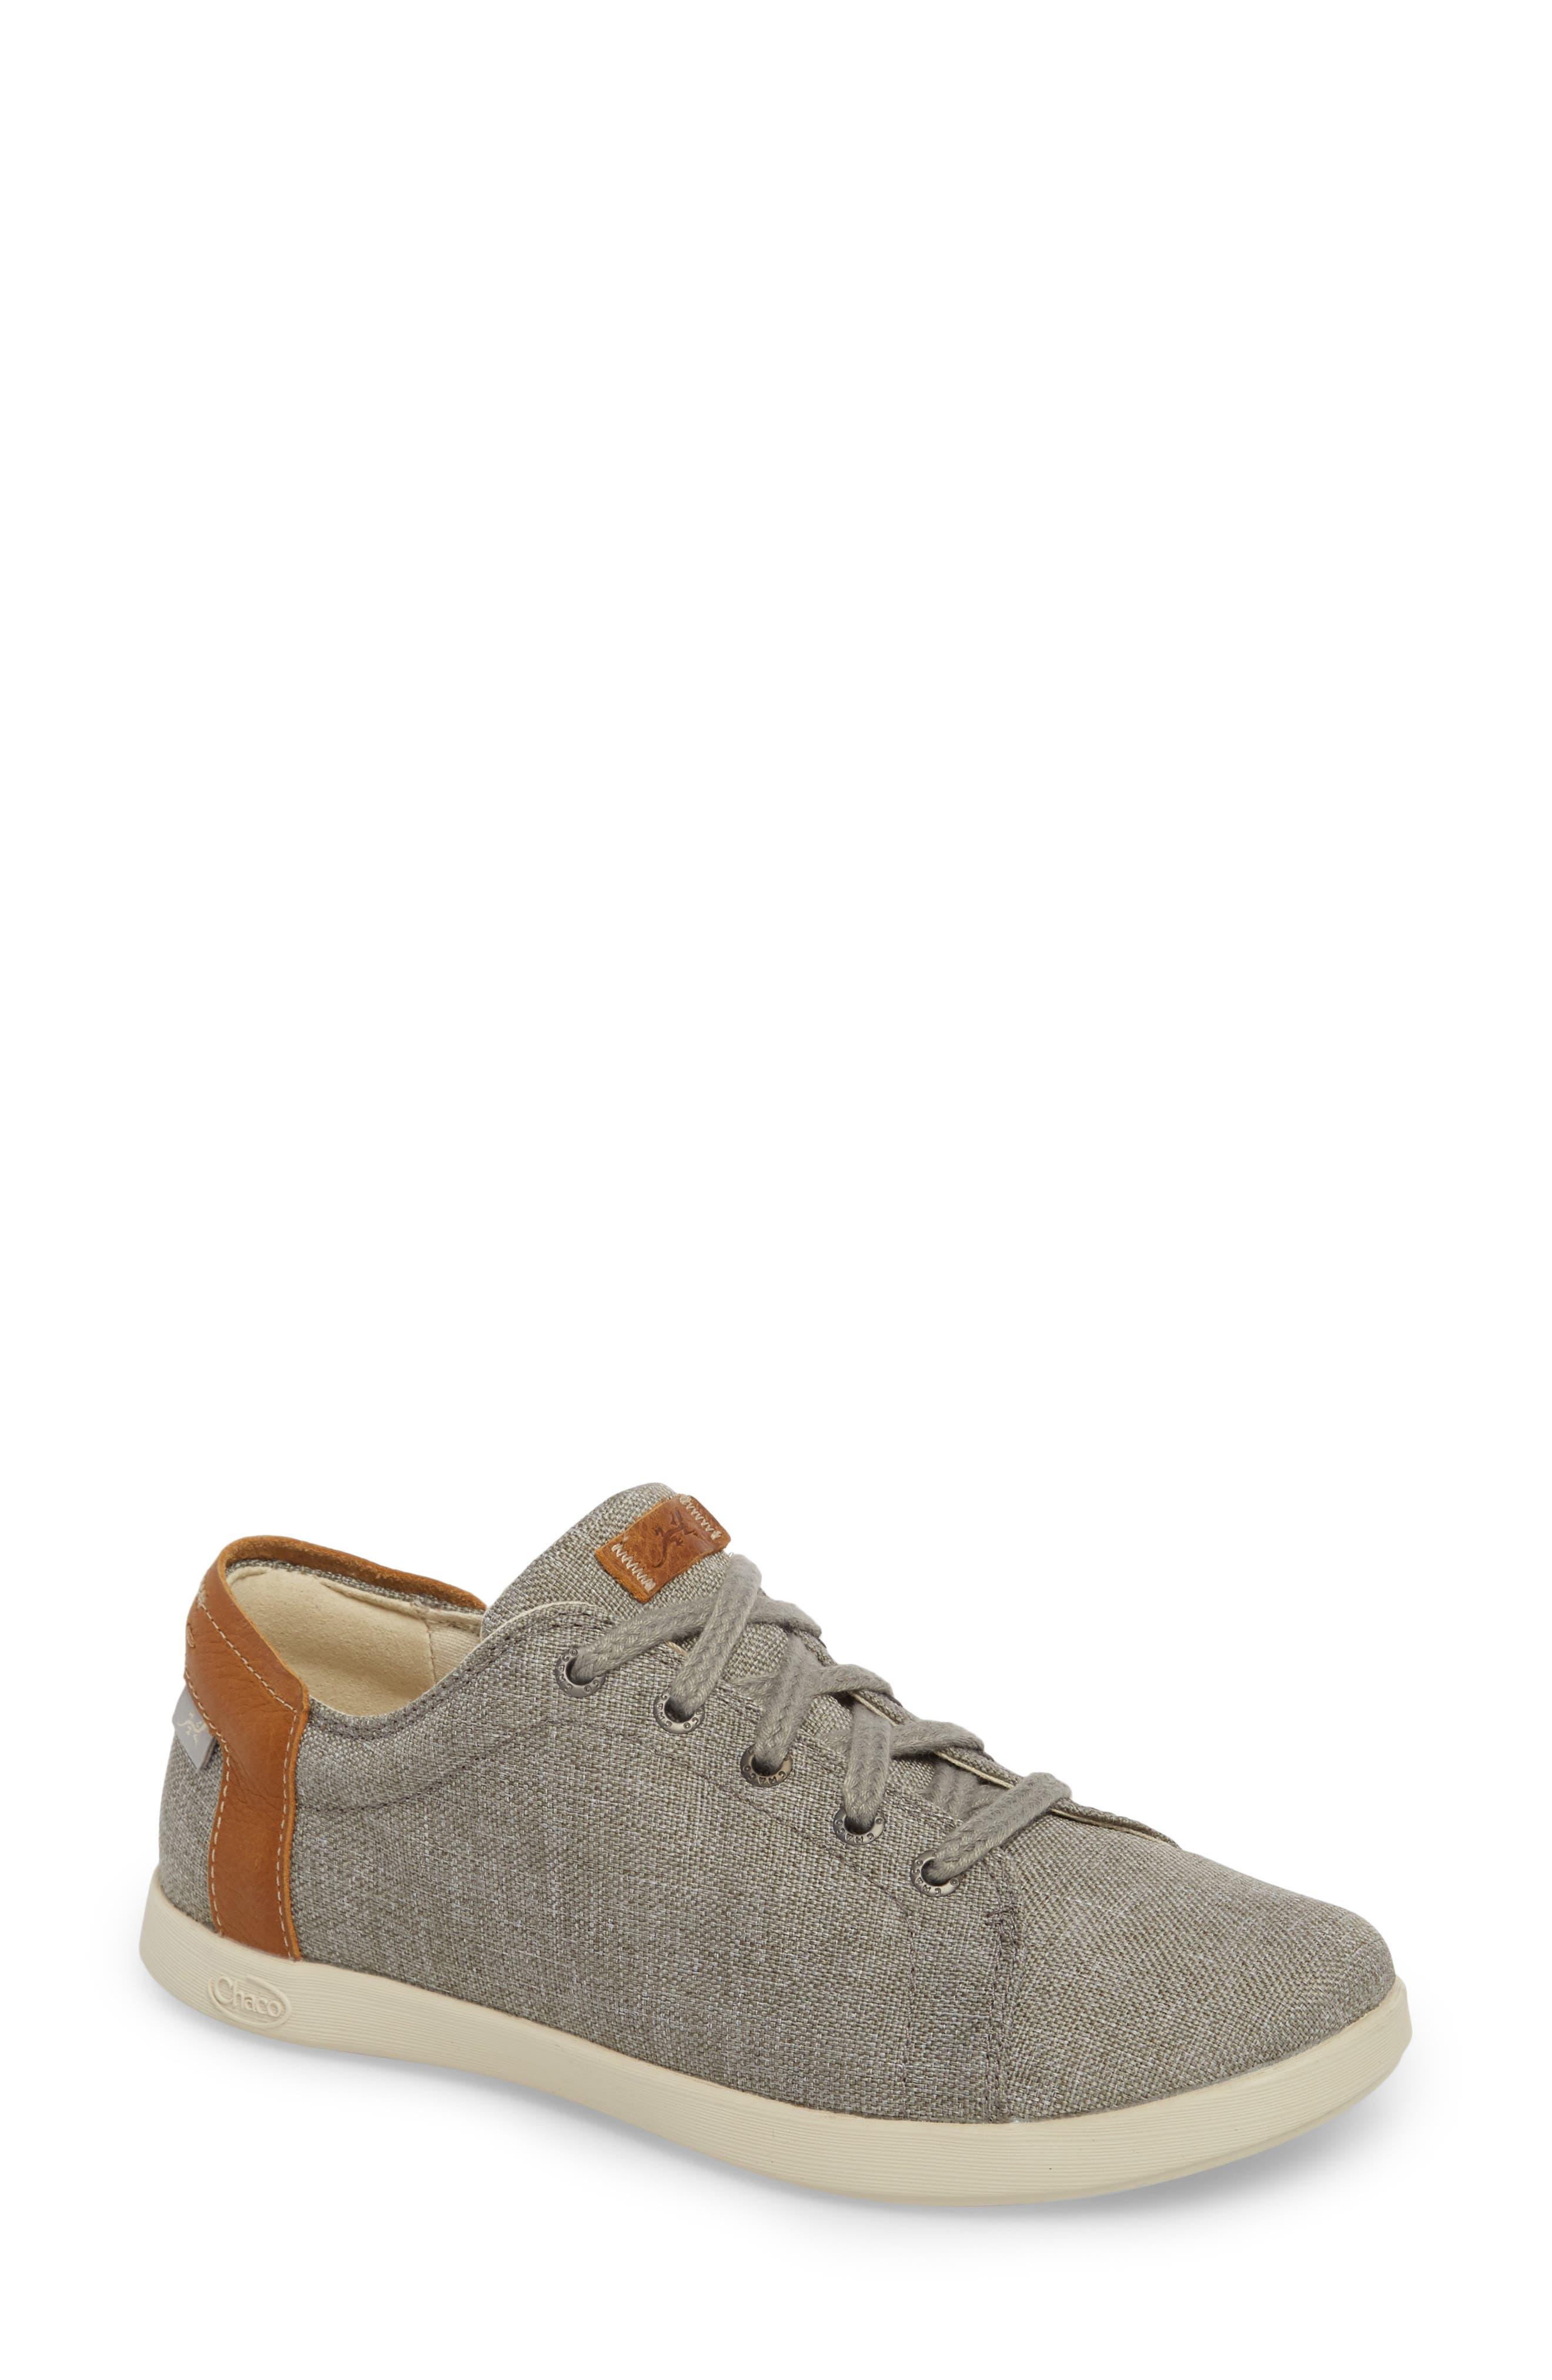 Ionia Sneaker,                             Main thumbnail 1, color,                             Gray Canvas